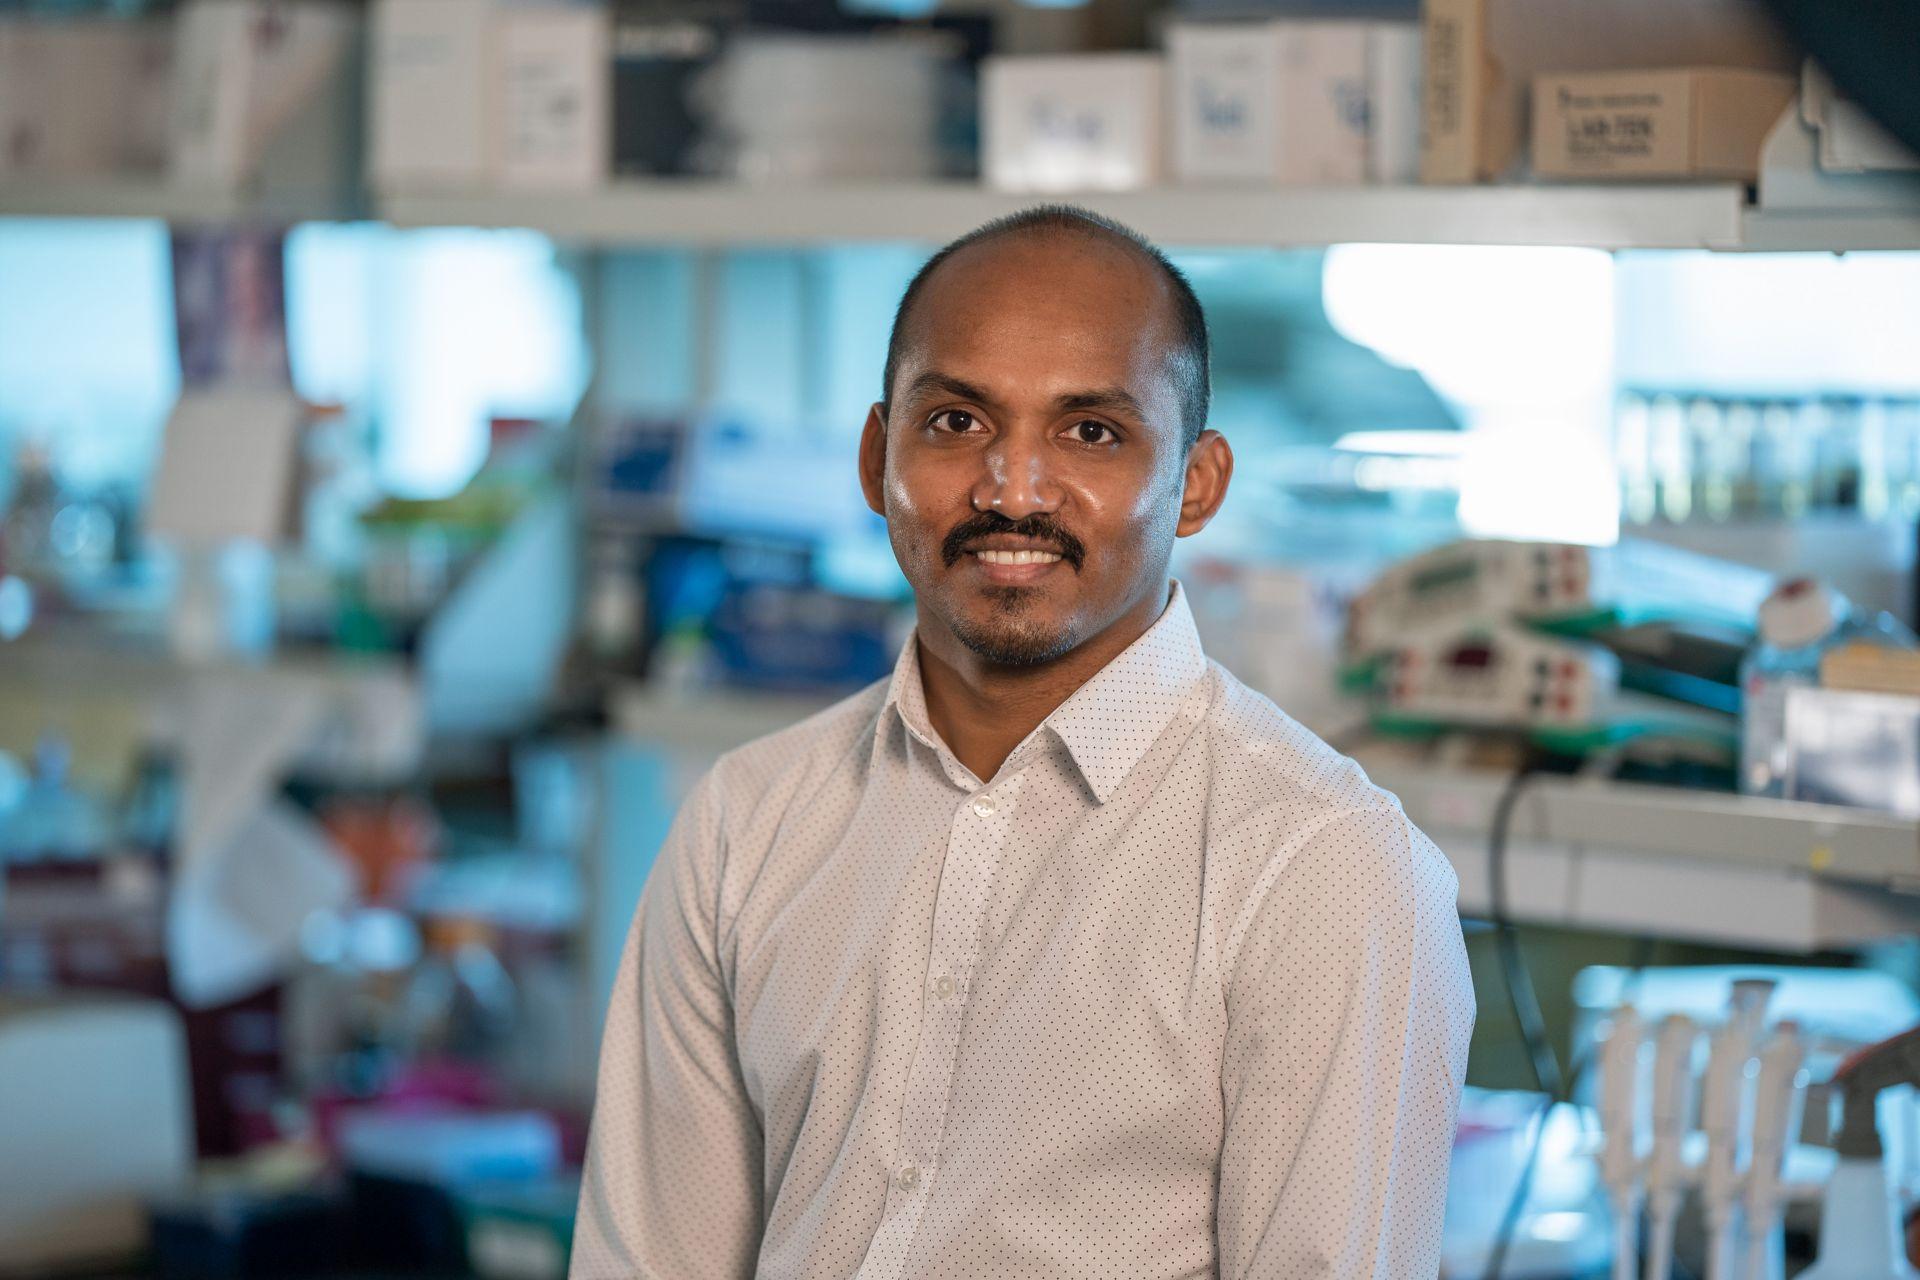 Nagakannan Pandian, PhD